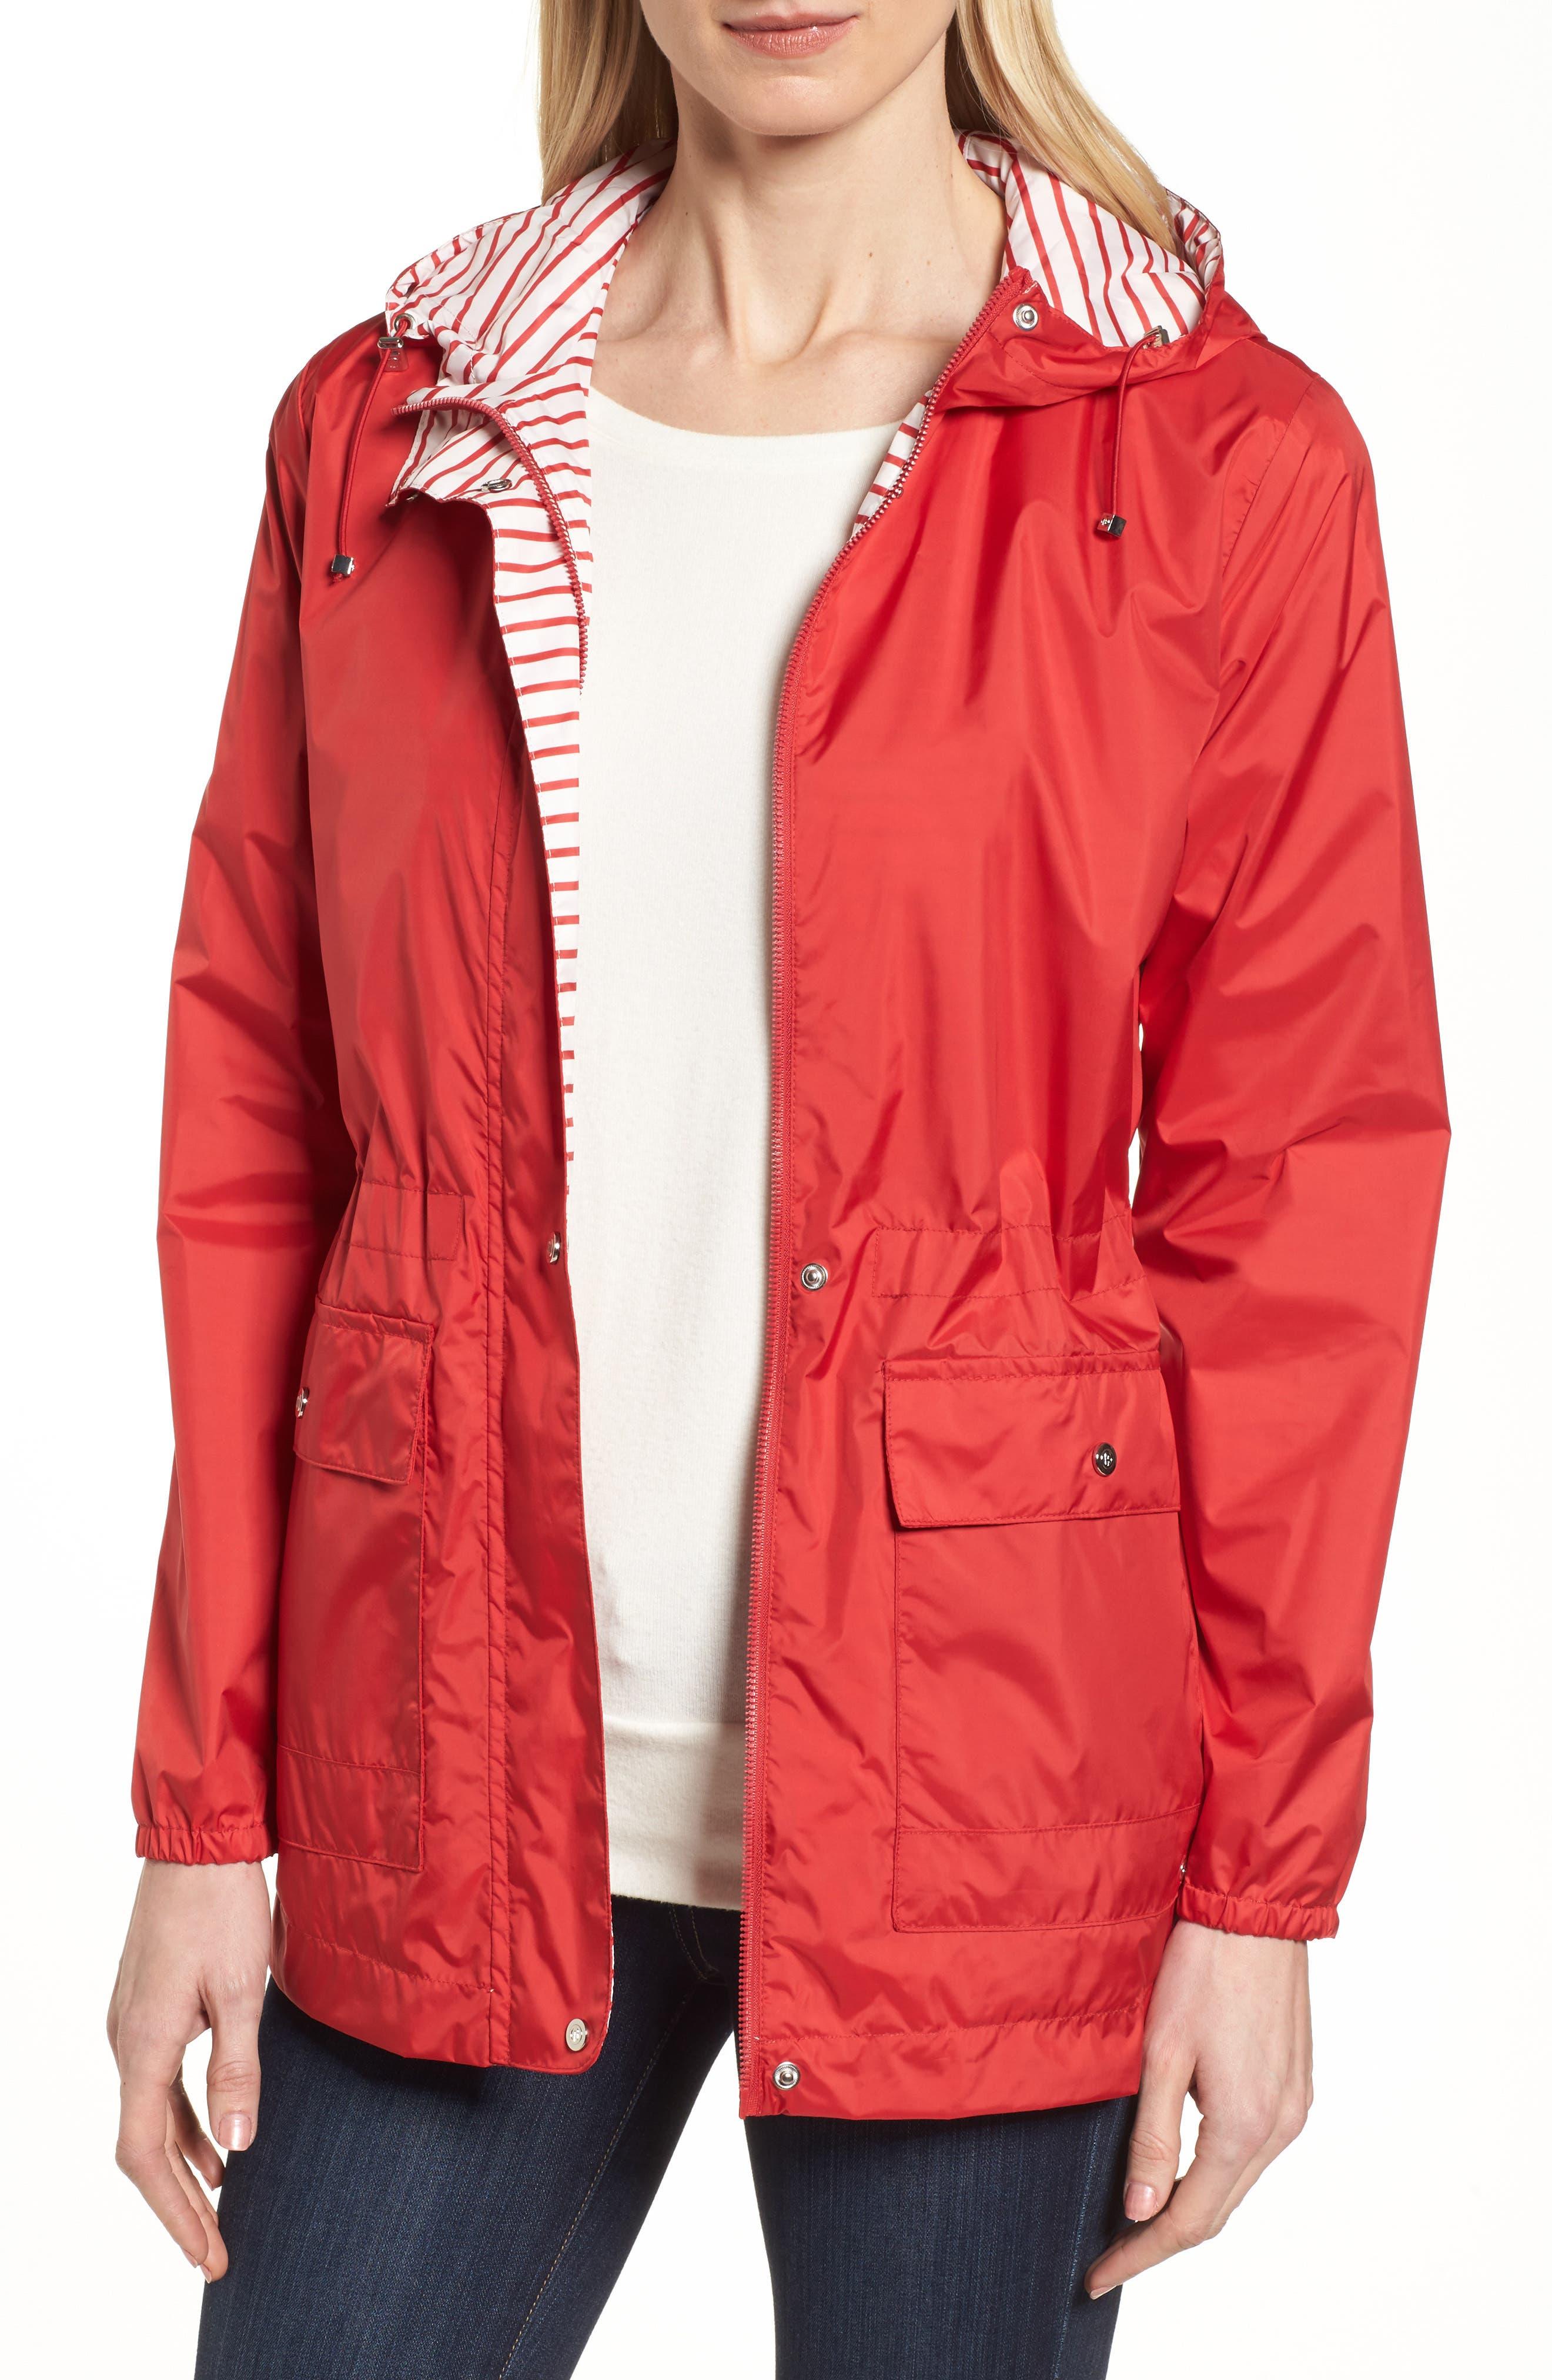 Bernardo Solid to Stripe Reversible Jacket